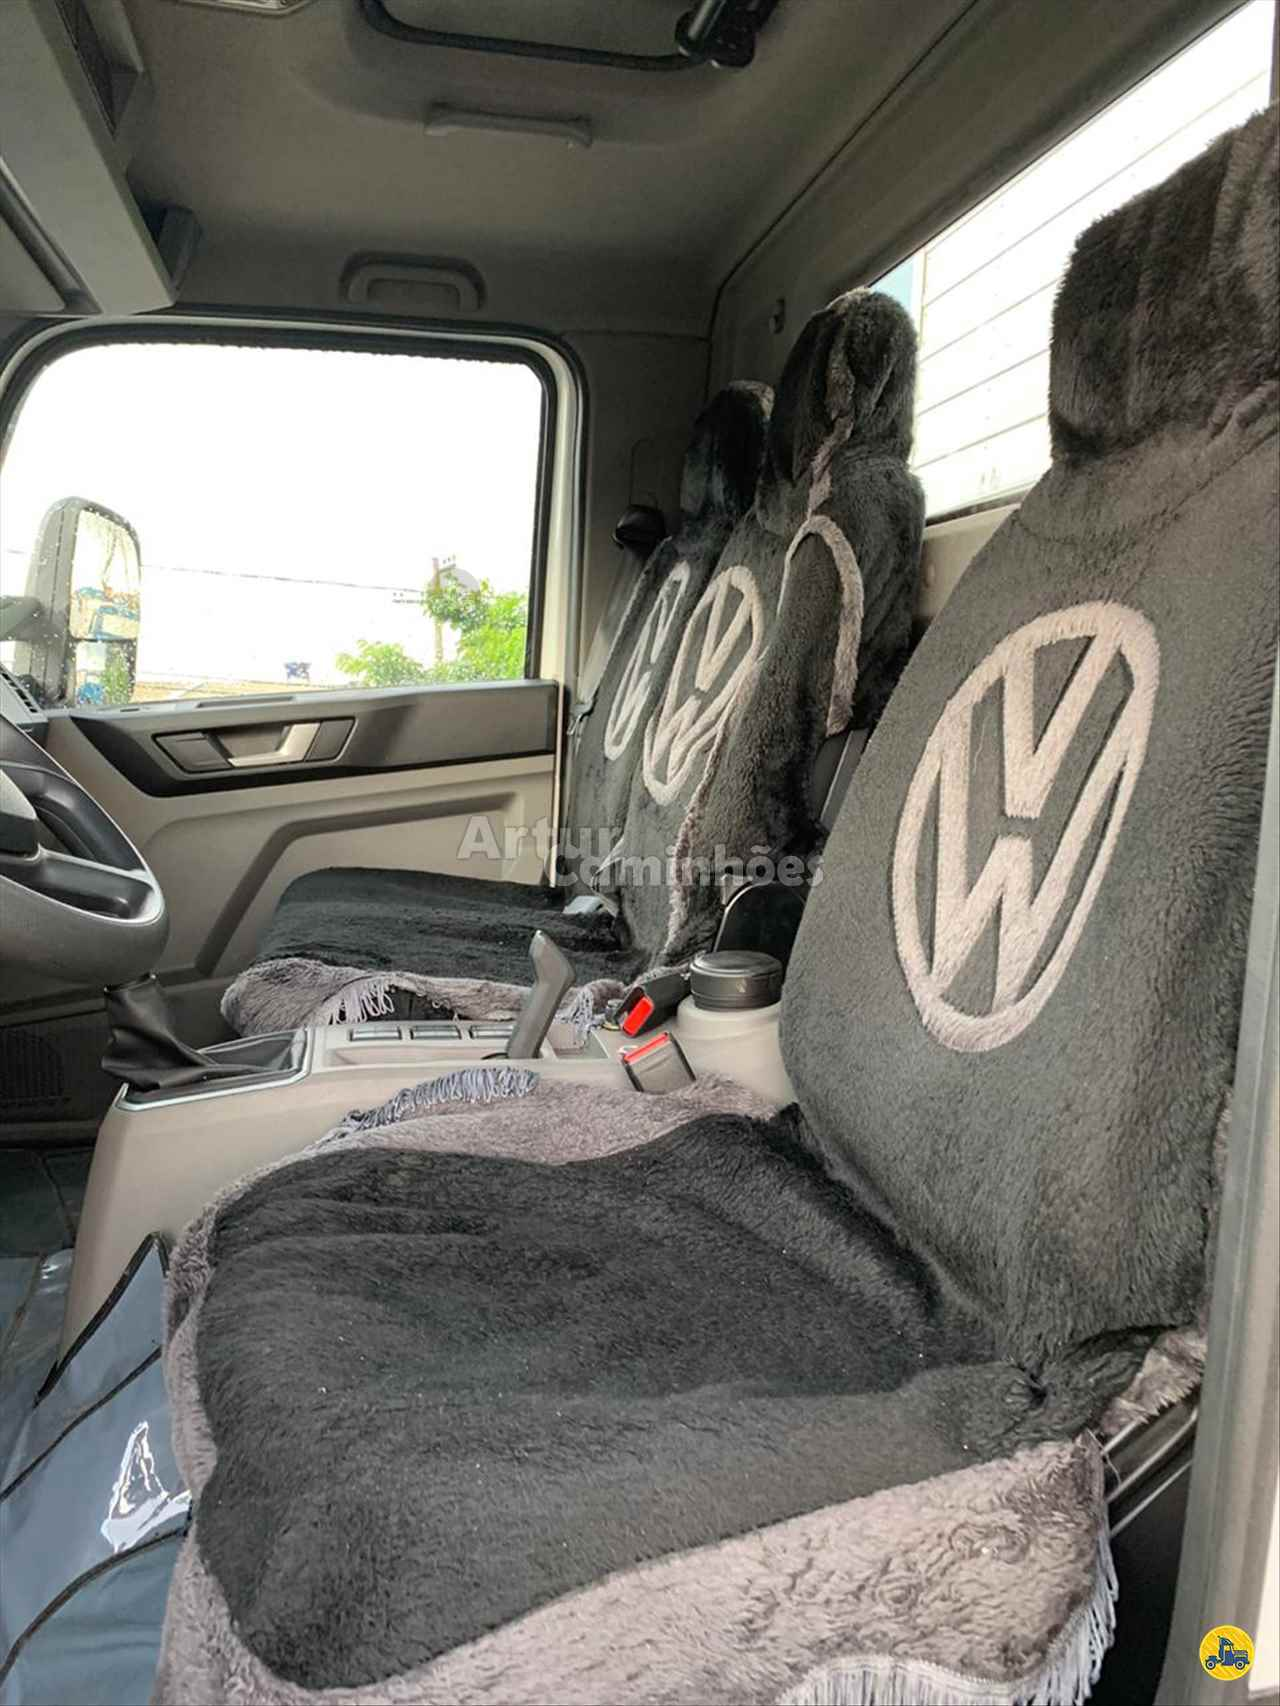 VOLKSWAGEN VW 11180 7100km 2018/2019 Artur Caminhões